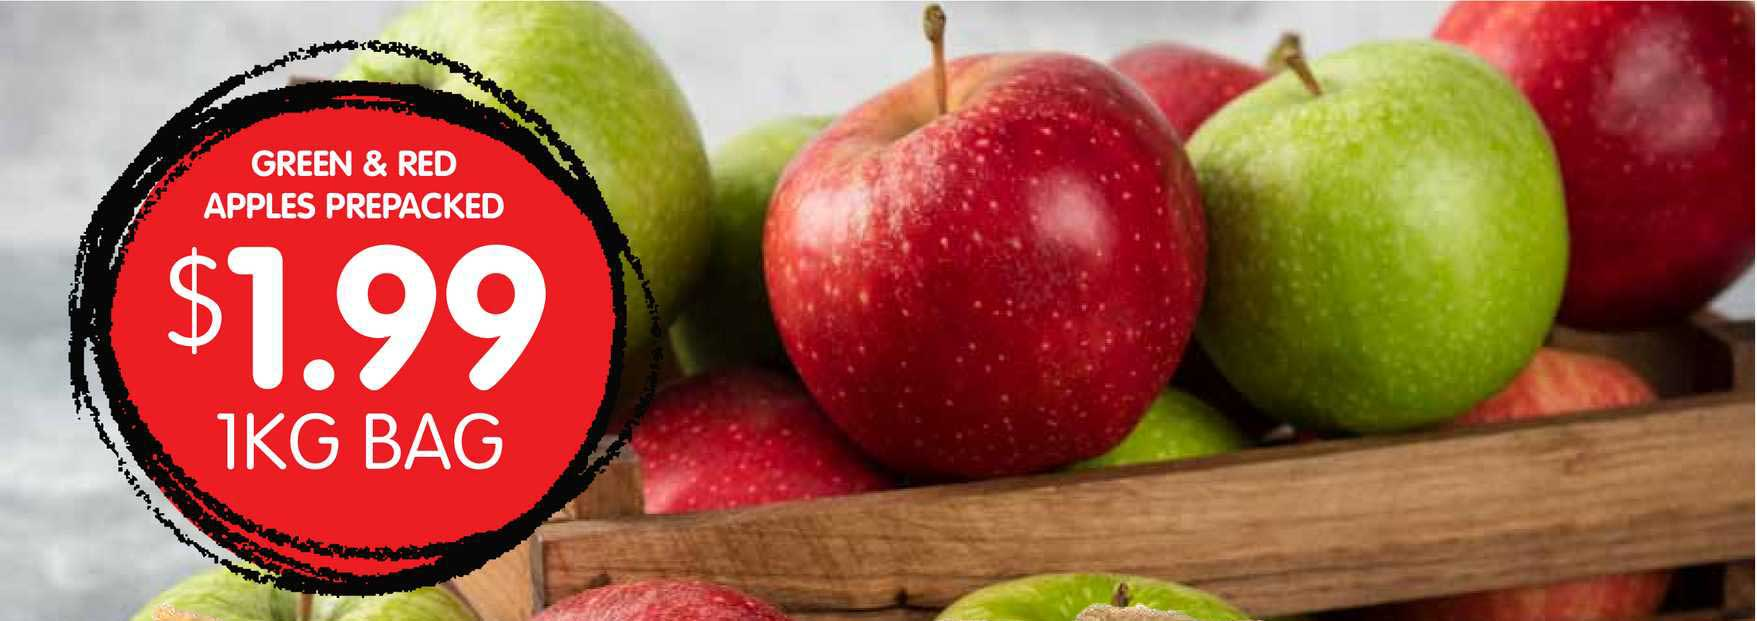 Spudshed Green & Red Apples Prepacked